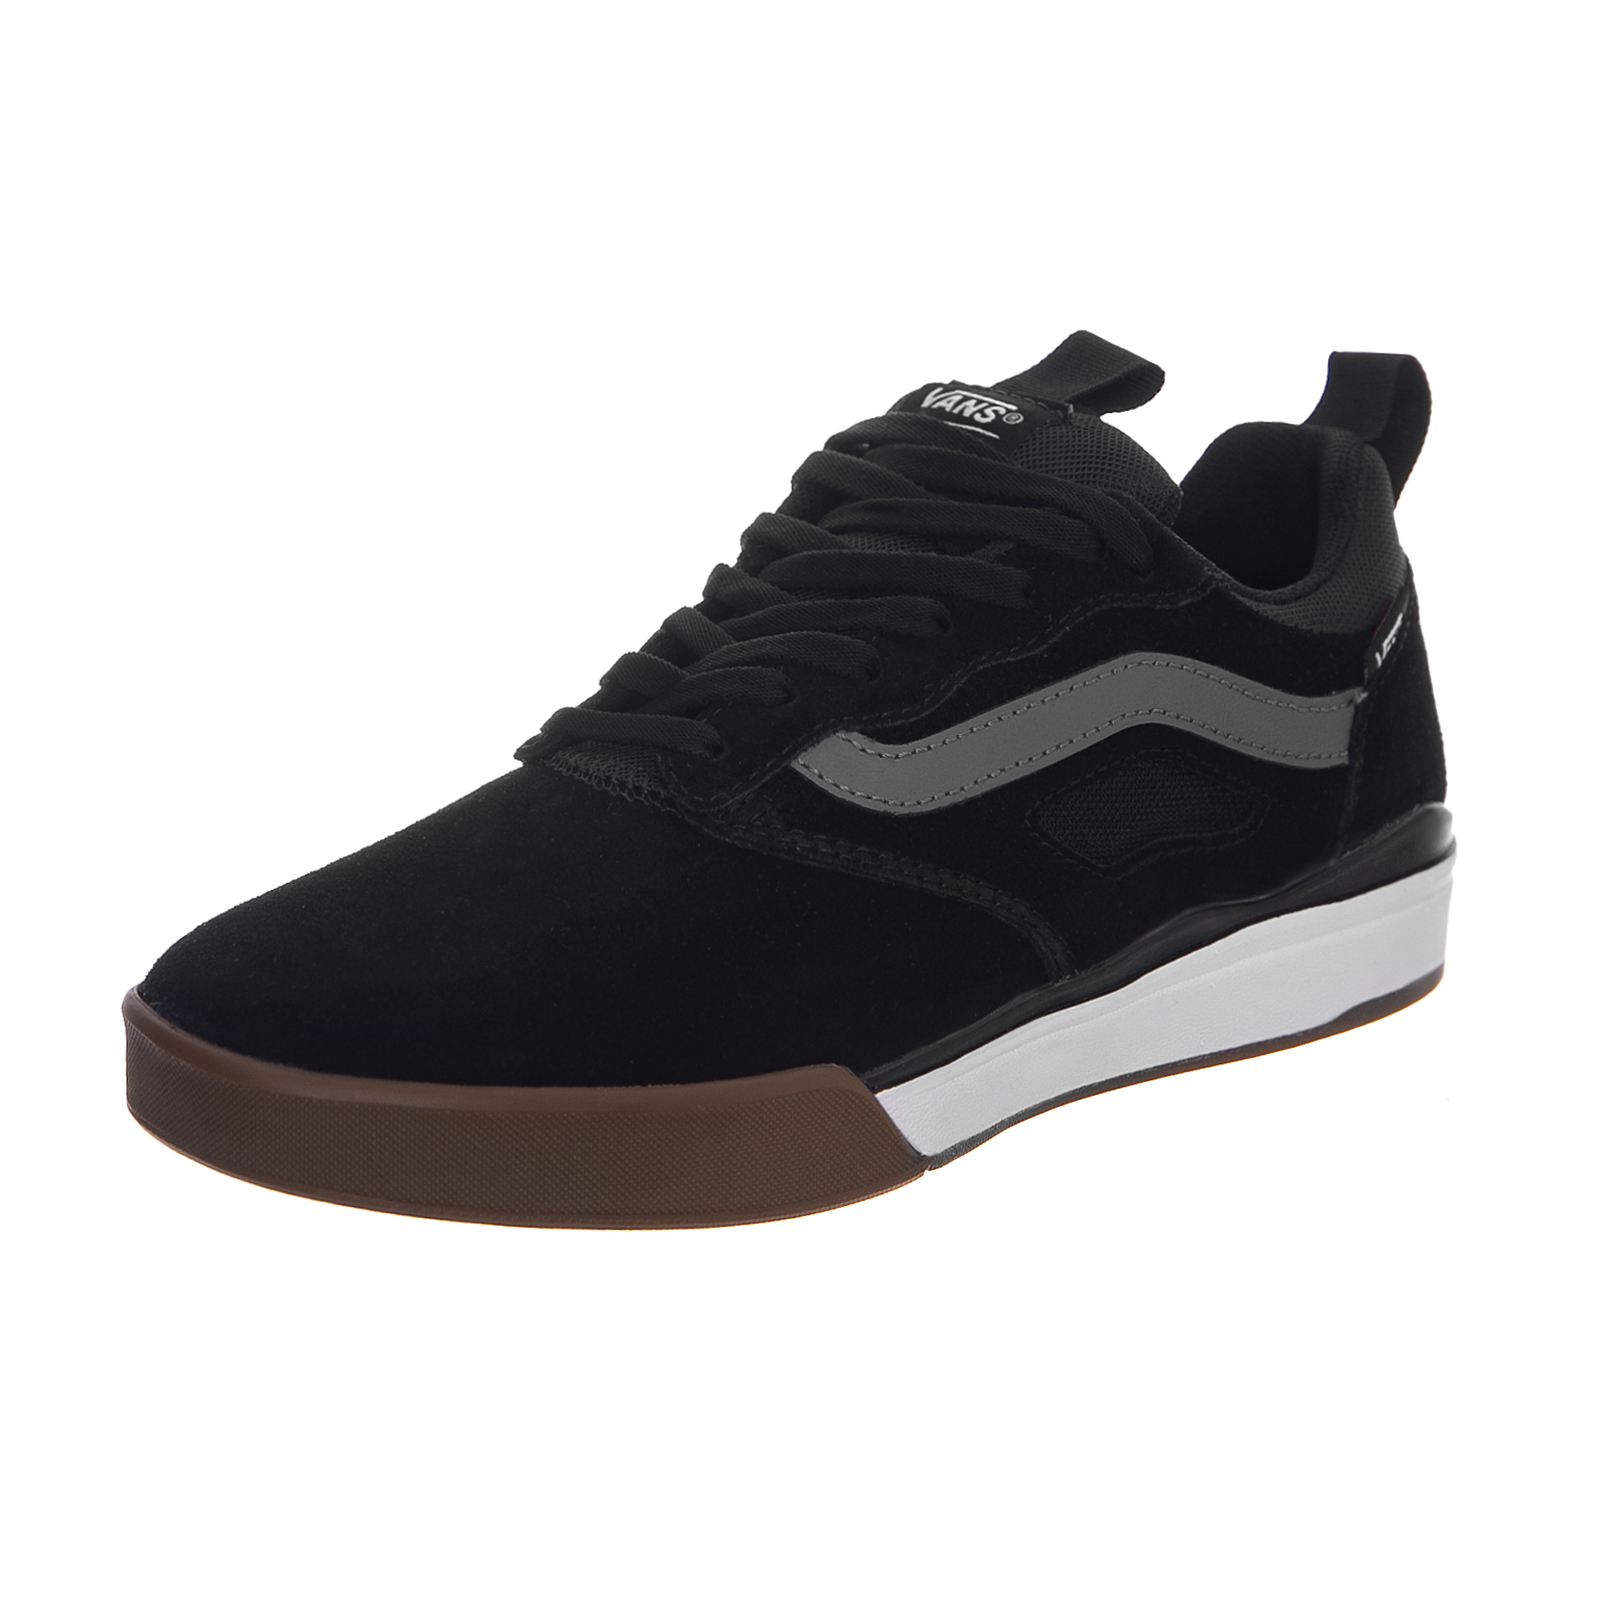 75c692a4e7b Vans Sneakers Mn Ultrarange Pro Black Gum White Black